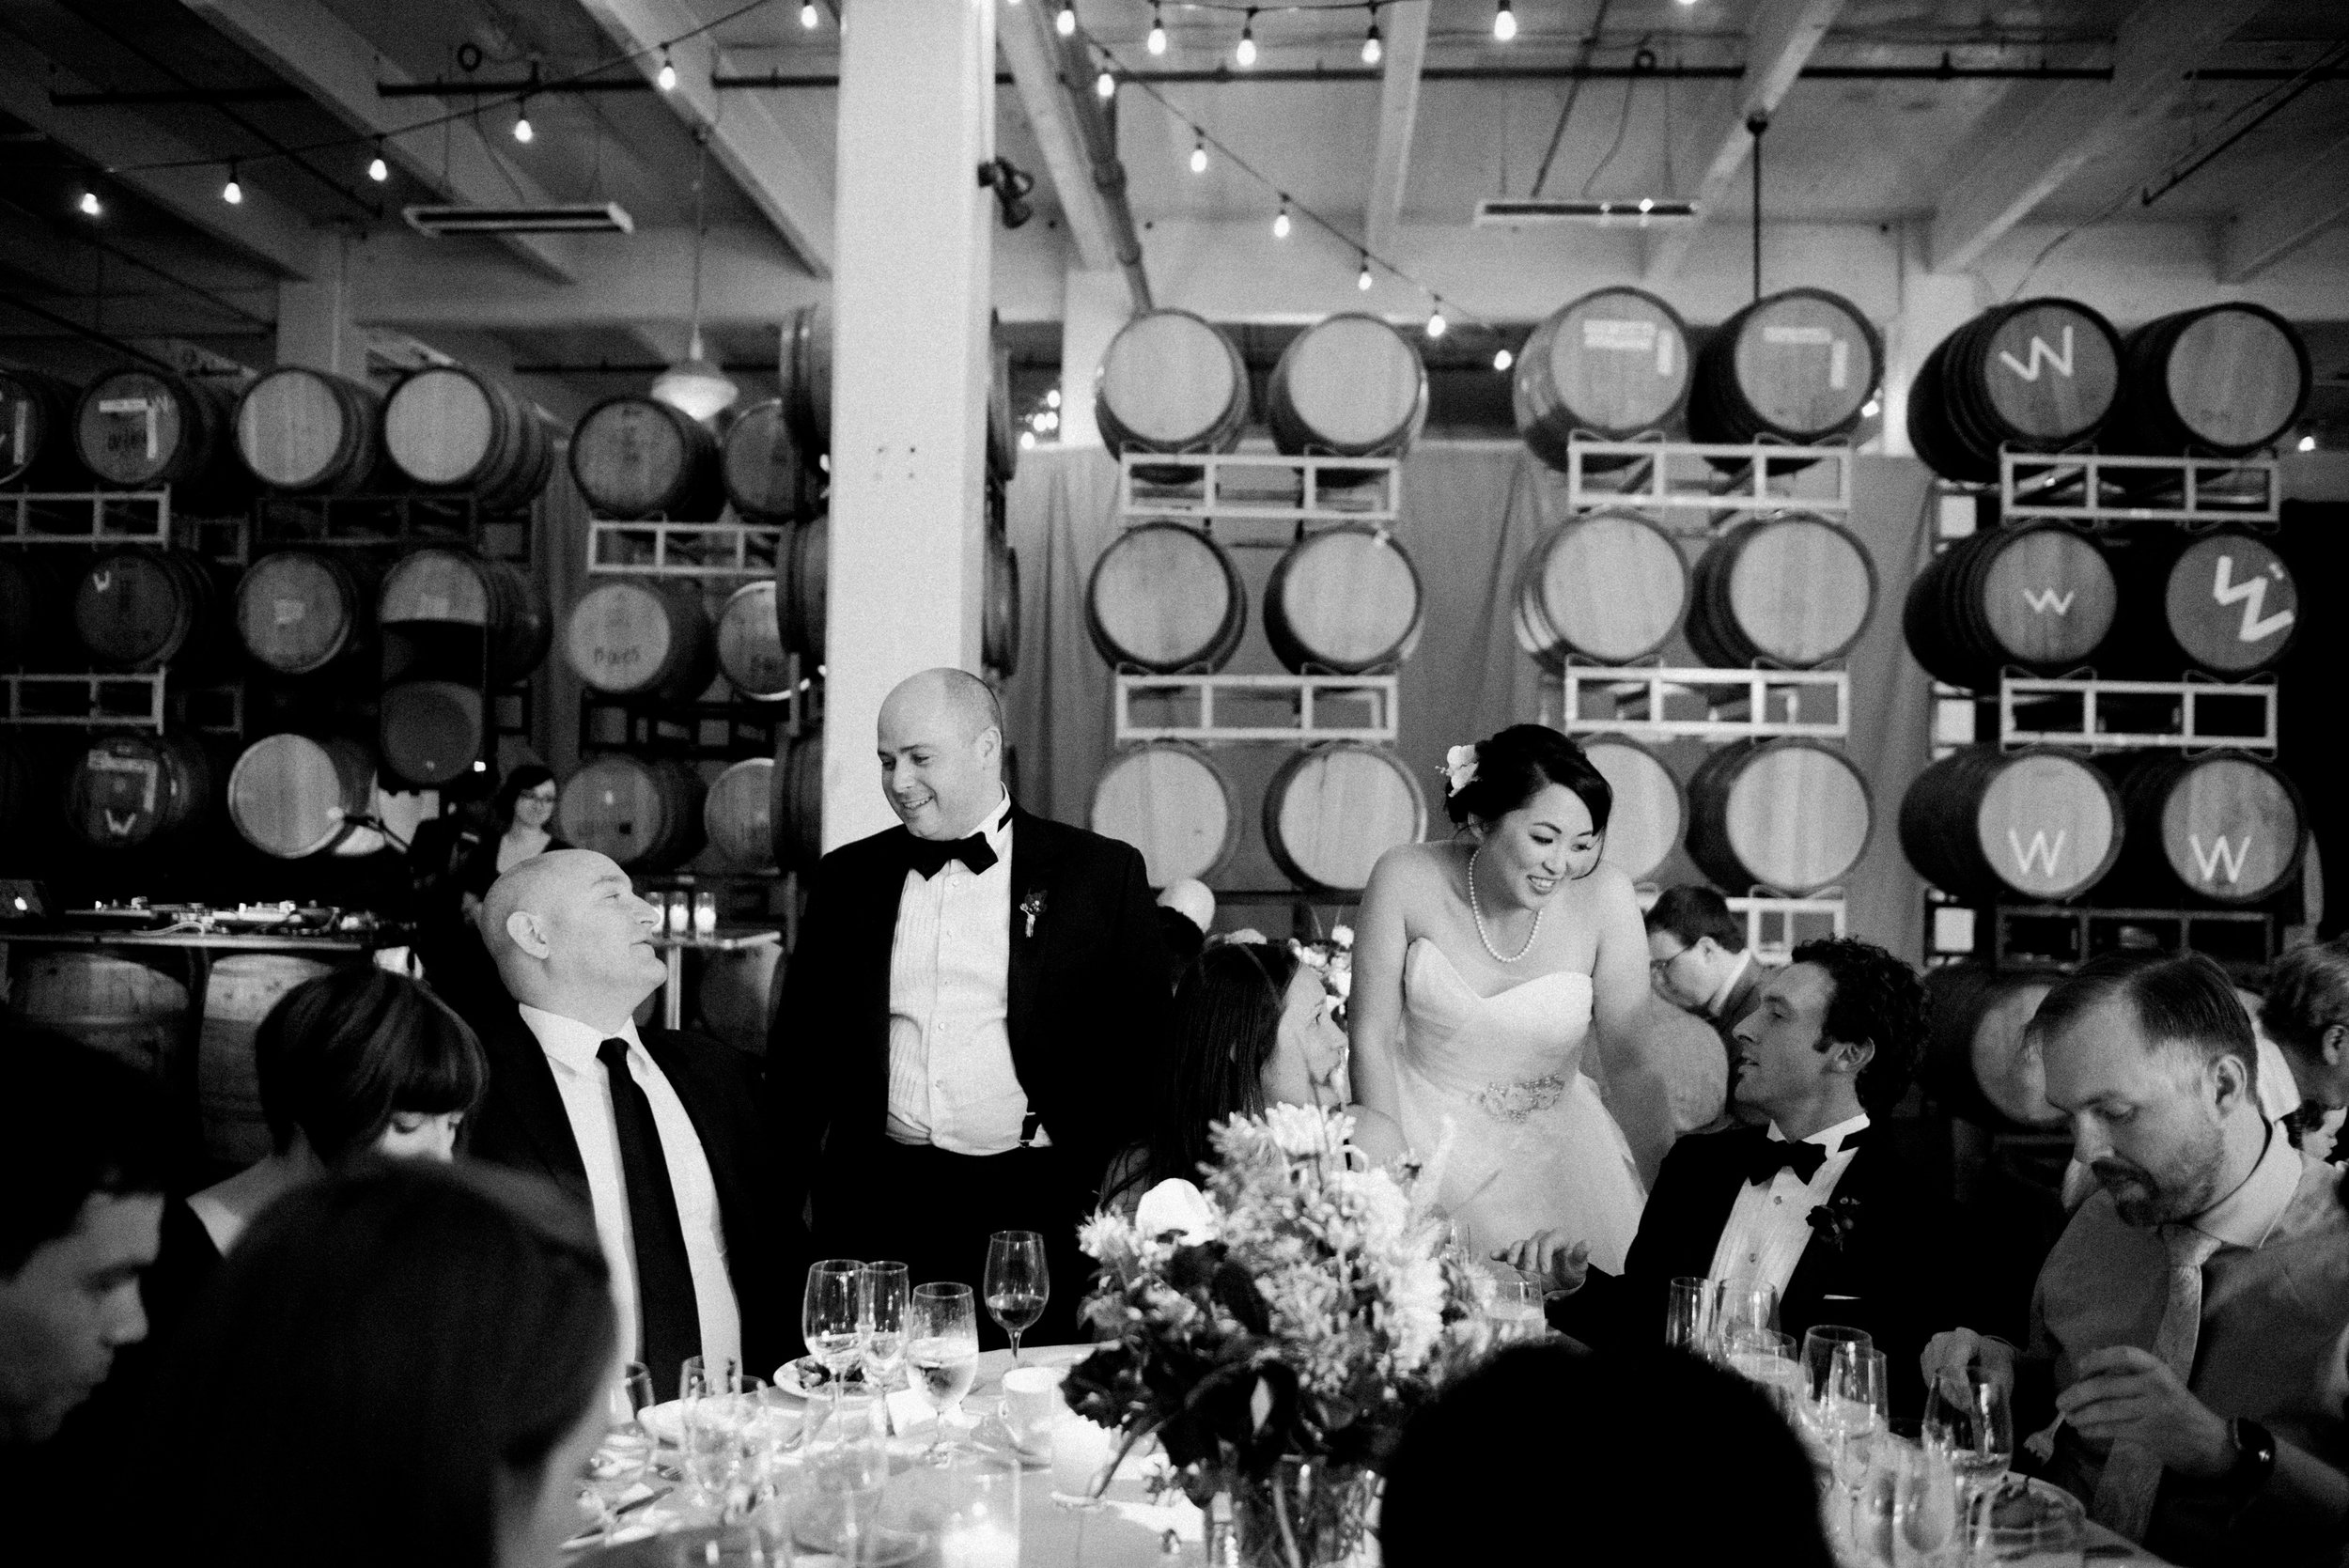 Swedenborgian Church Dogpatch Winery Wedding071.jpg